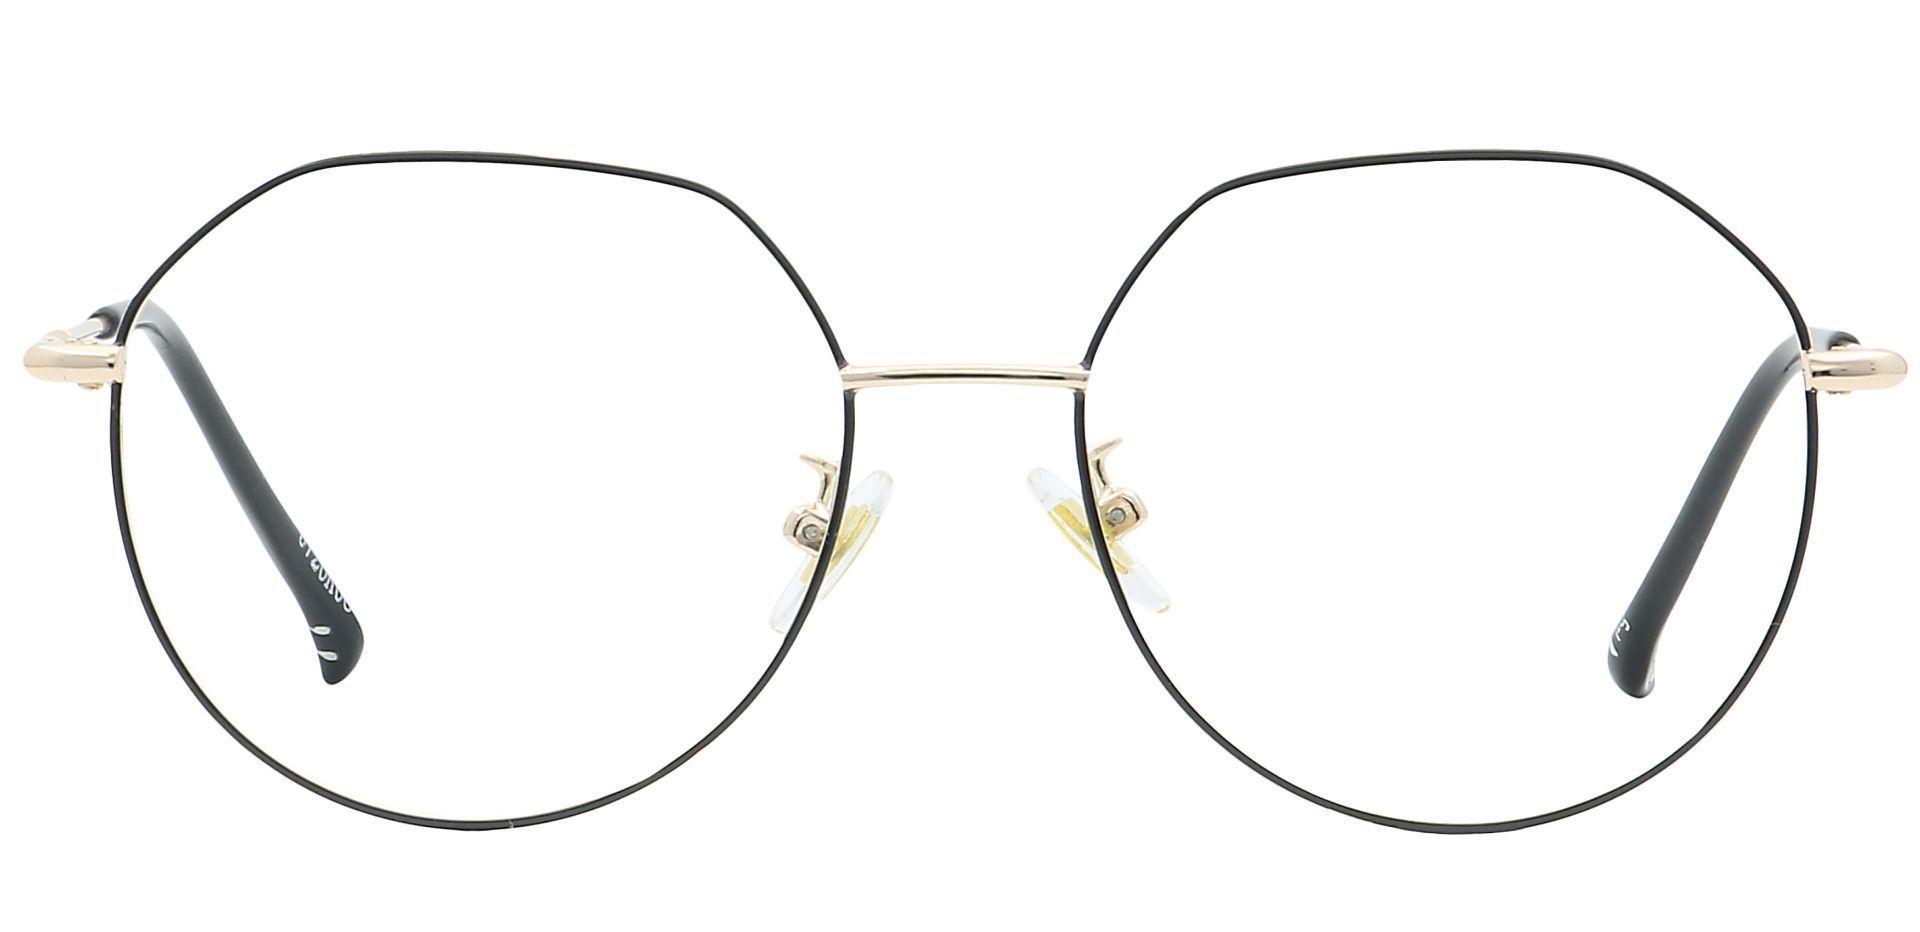 Wesley Round Prescription Glasses - Black